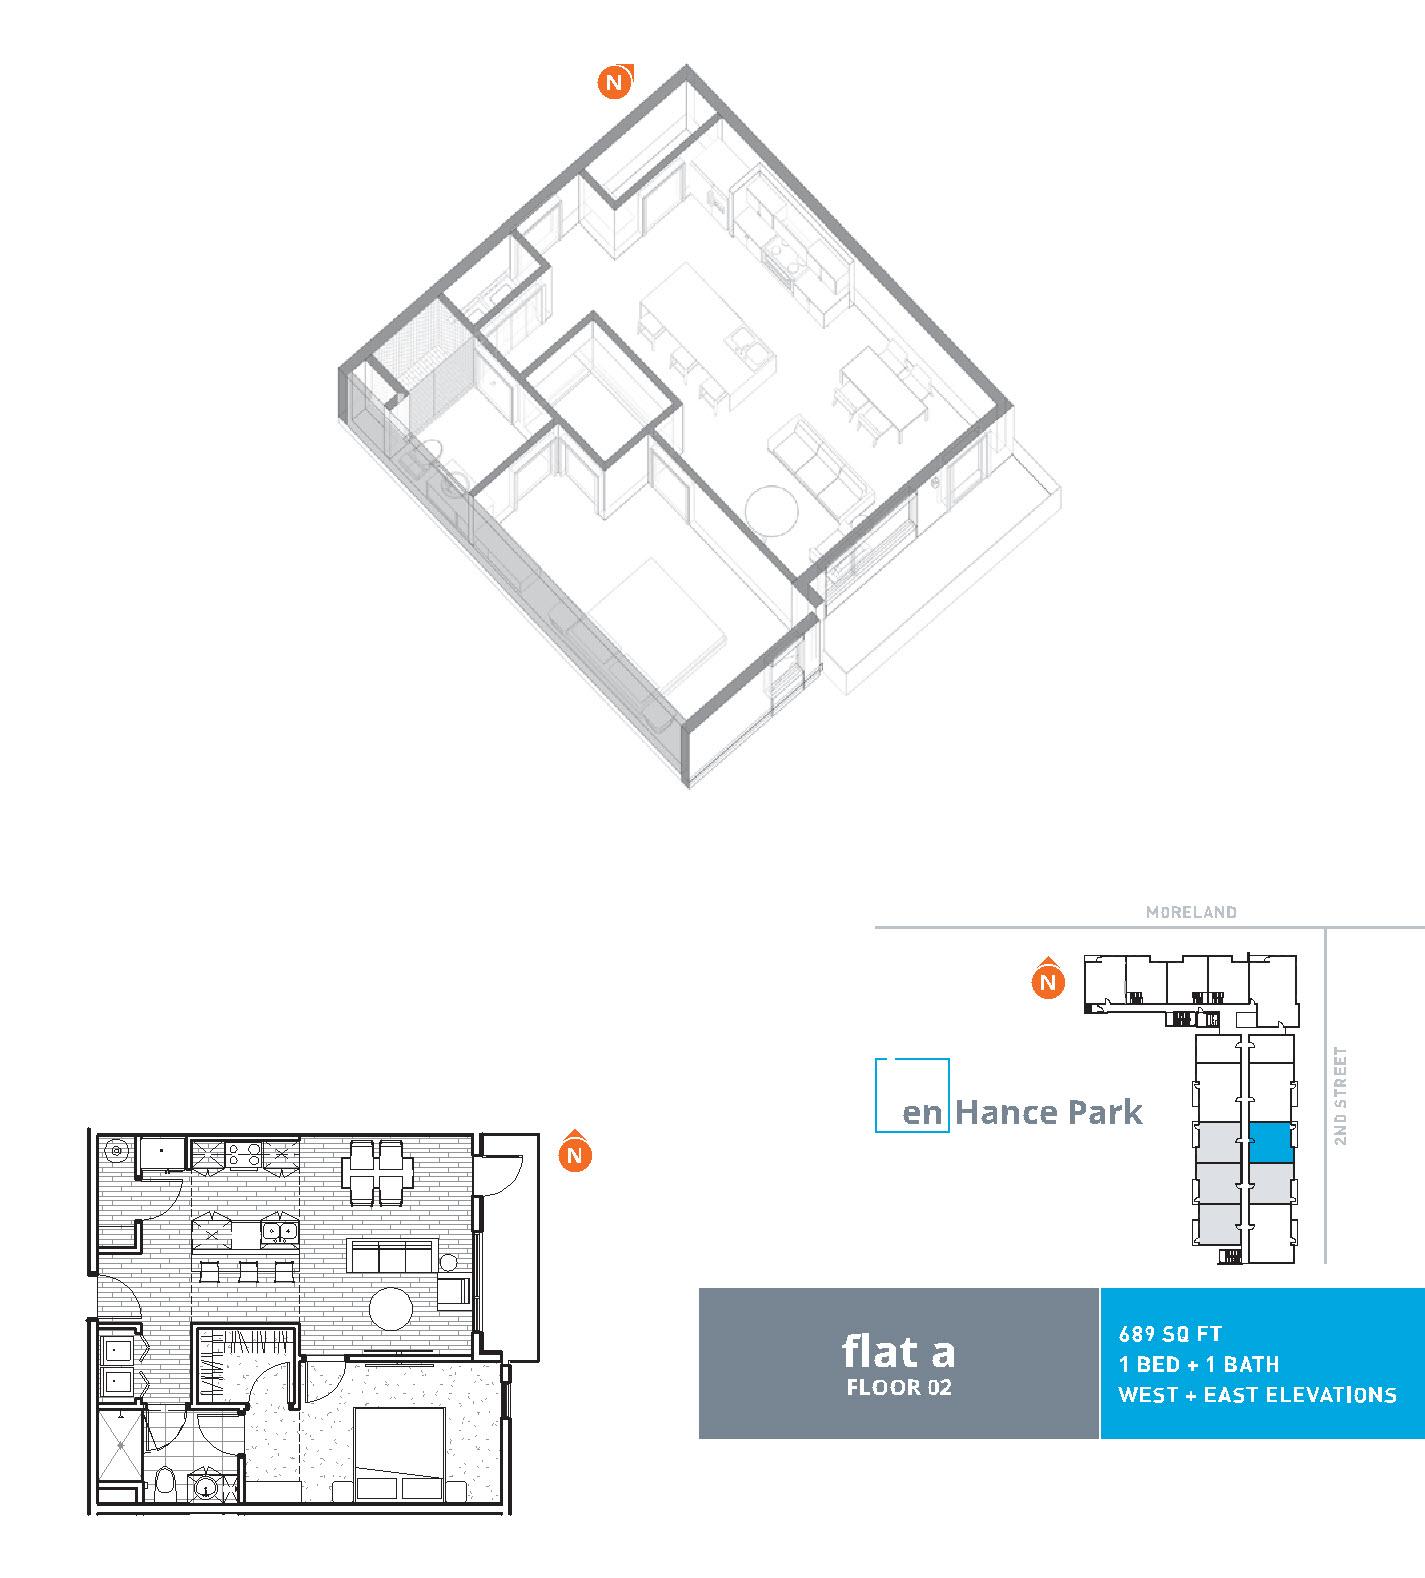 En hance park condo floor plan flat a 1bd